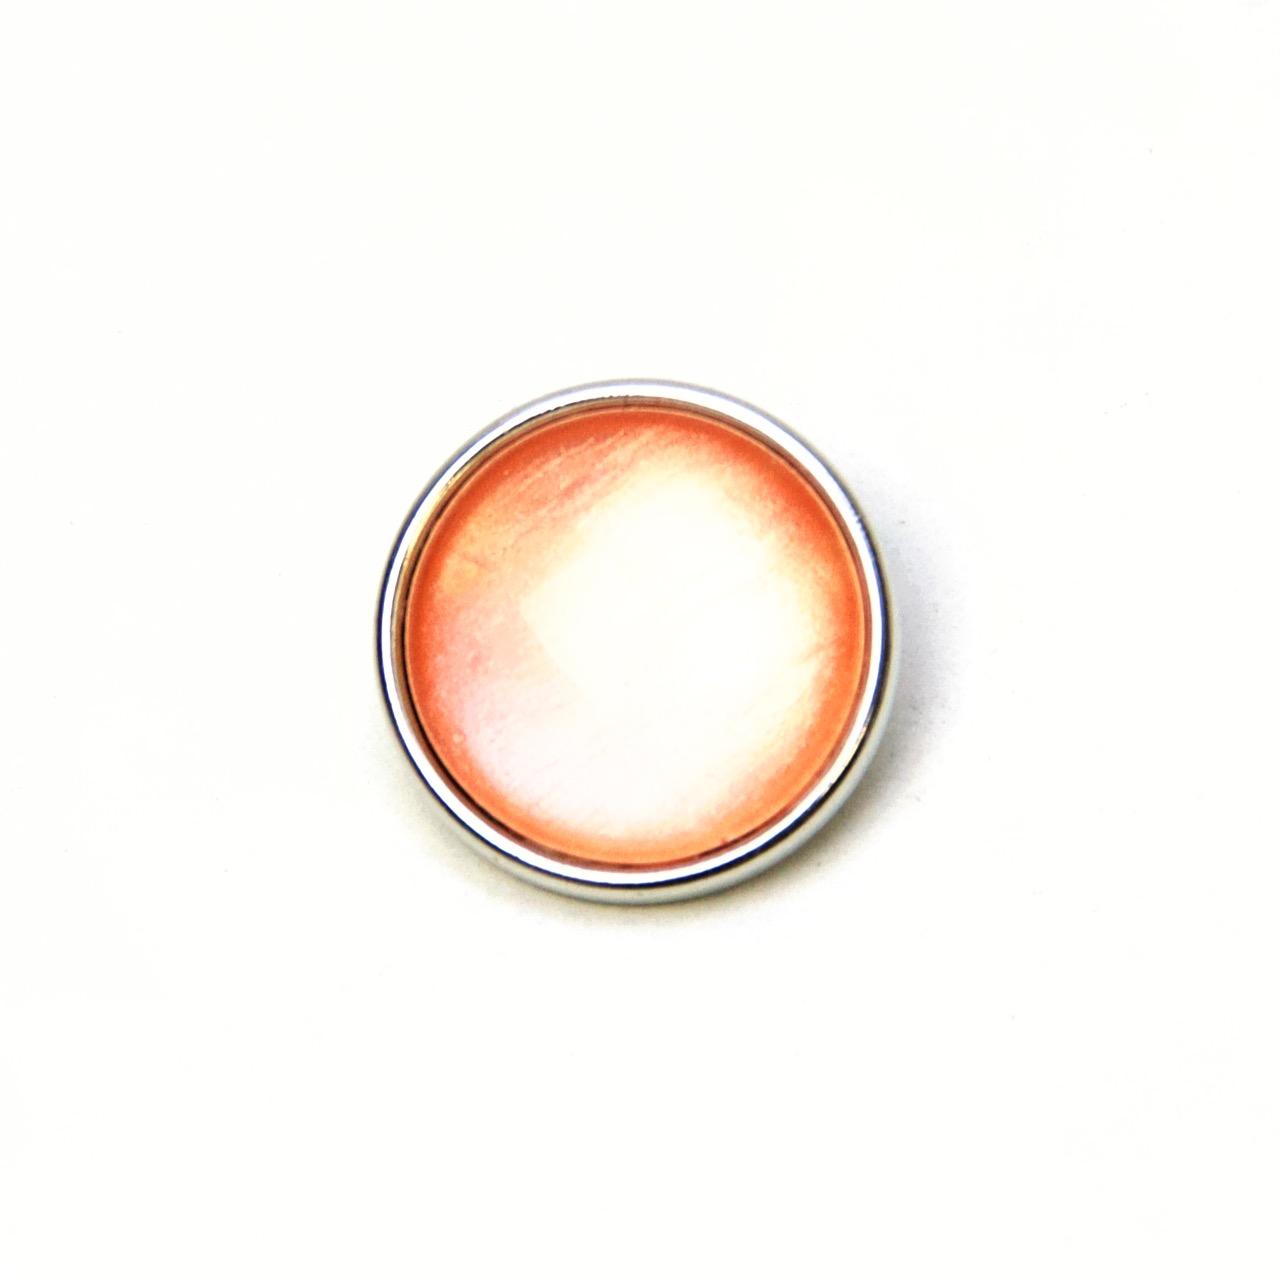 Druckknopf handbemalt in hellem apricot schimmernd